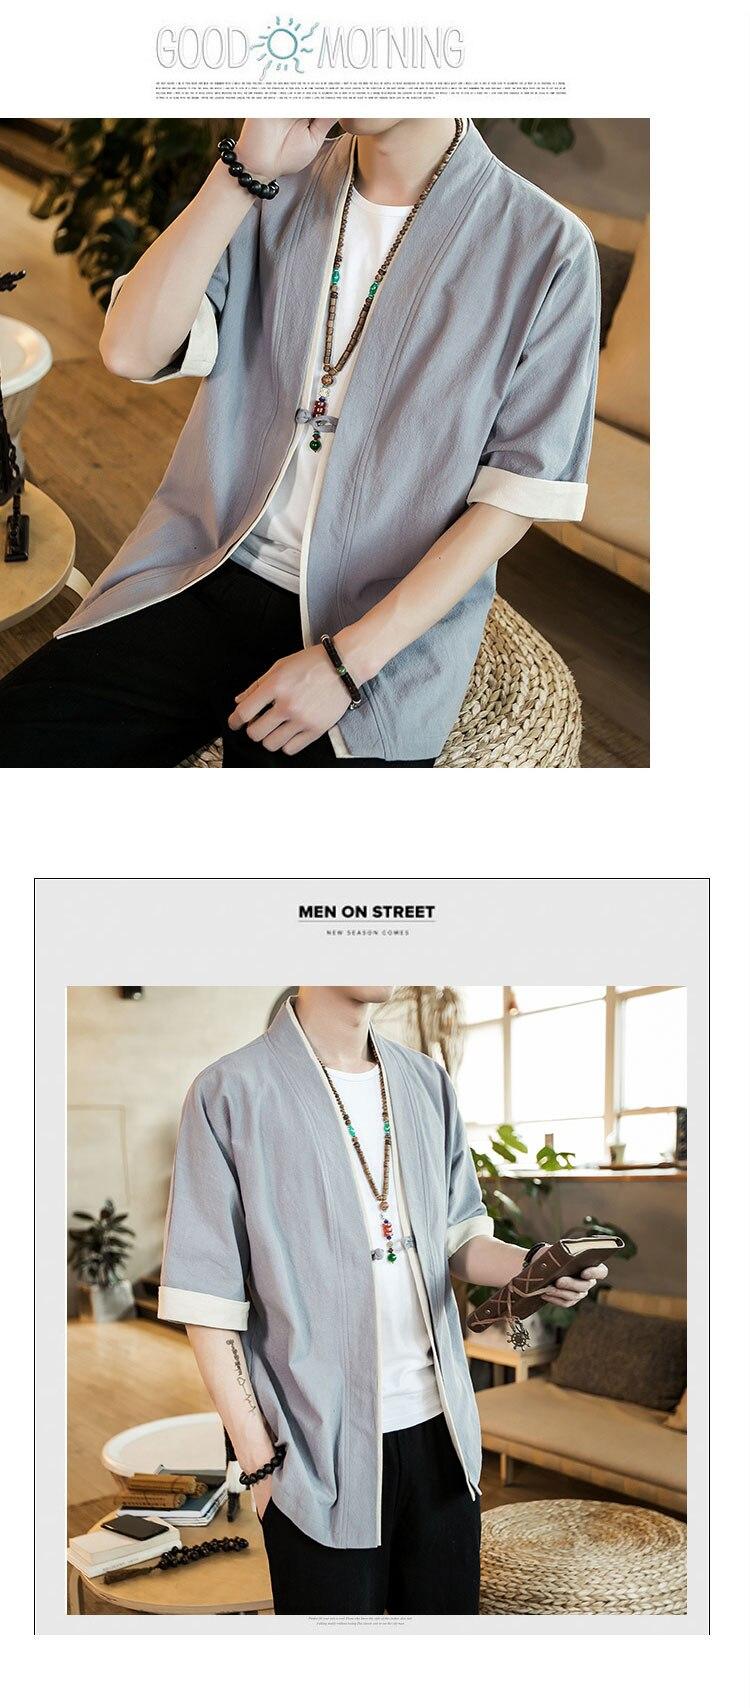 HTB1uOUatDJYBeNjy1zeq6yhzVXap 2019 Men Cotton Linen Jacket China Style Kongfu Coat Male Loose Kimono Cardigan Overcoat Open Stitch Coat Mens Windbreaker 5XL